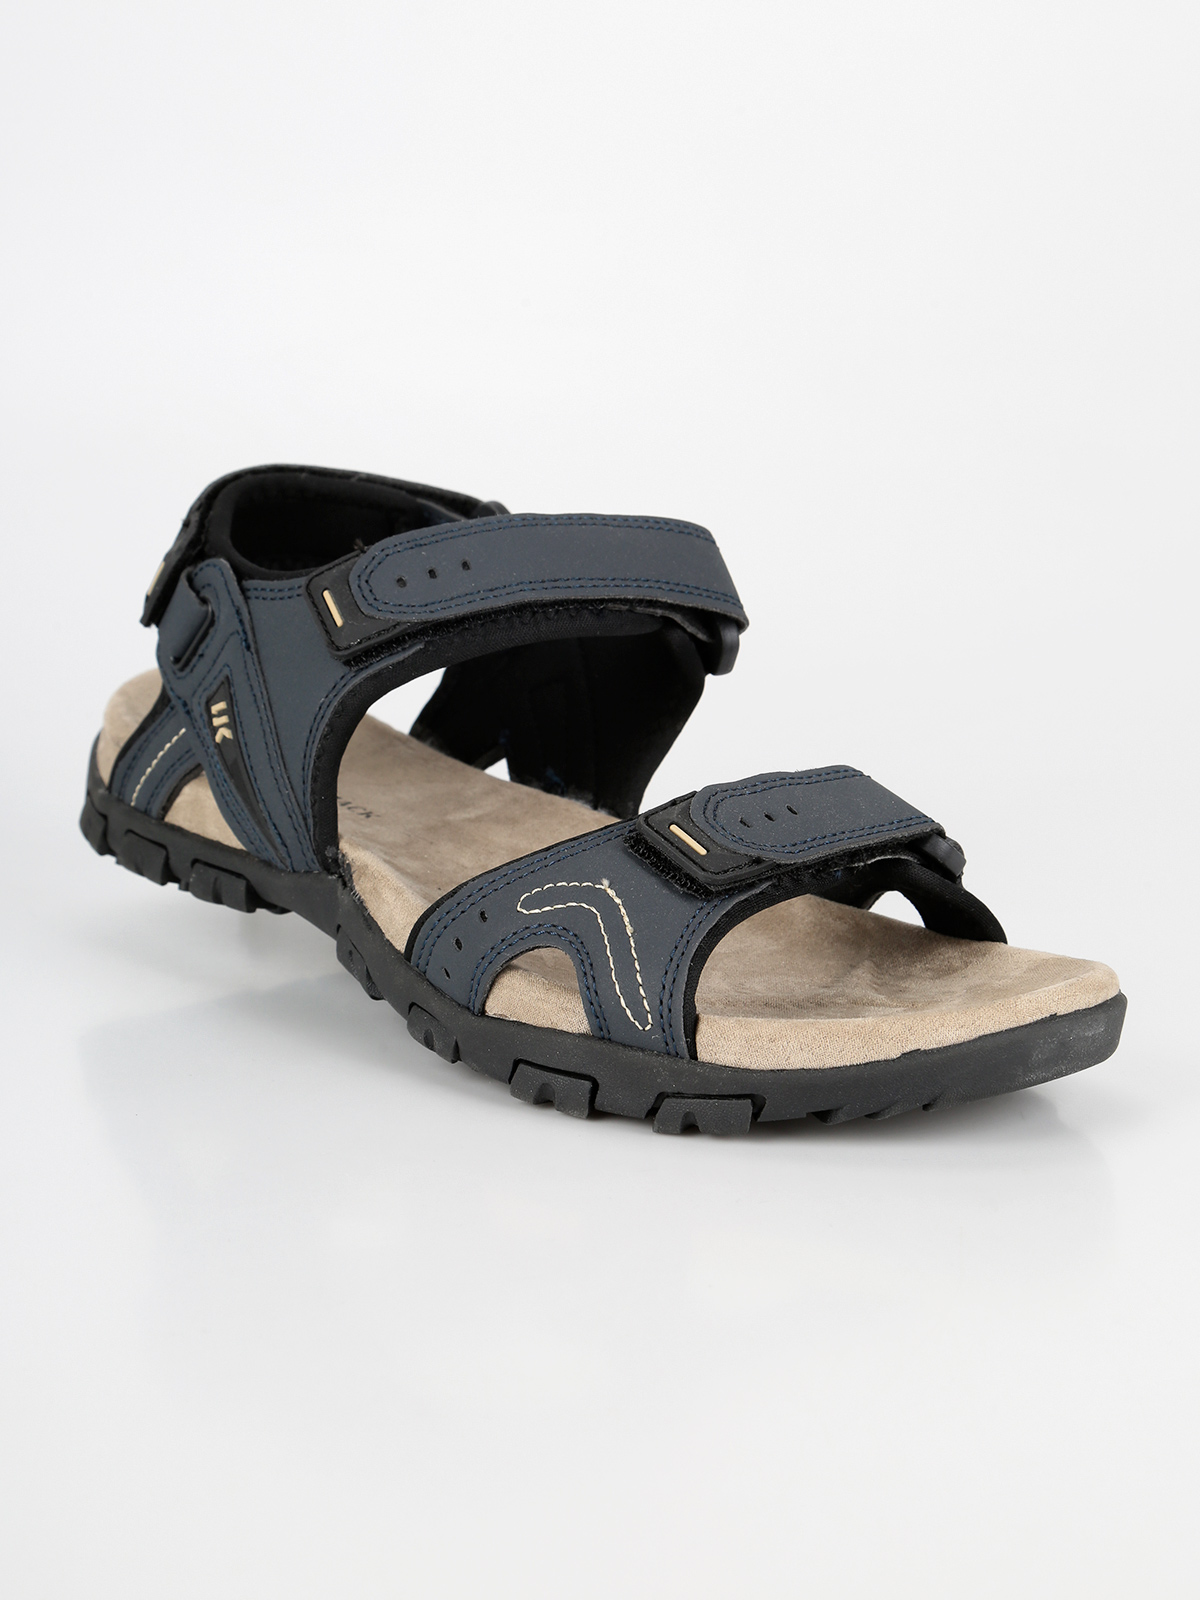 LUMBERJACK Spring Summer man's casual Fahion cosy Blue Man's sandal sandal